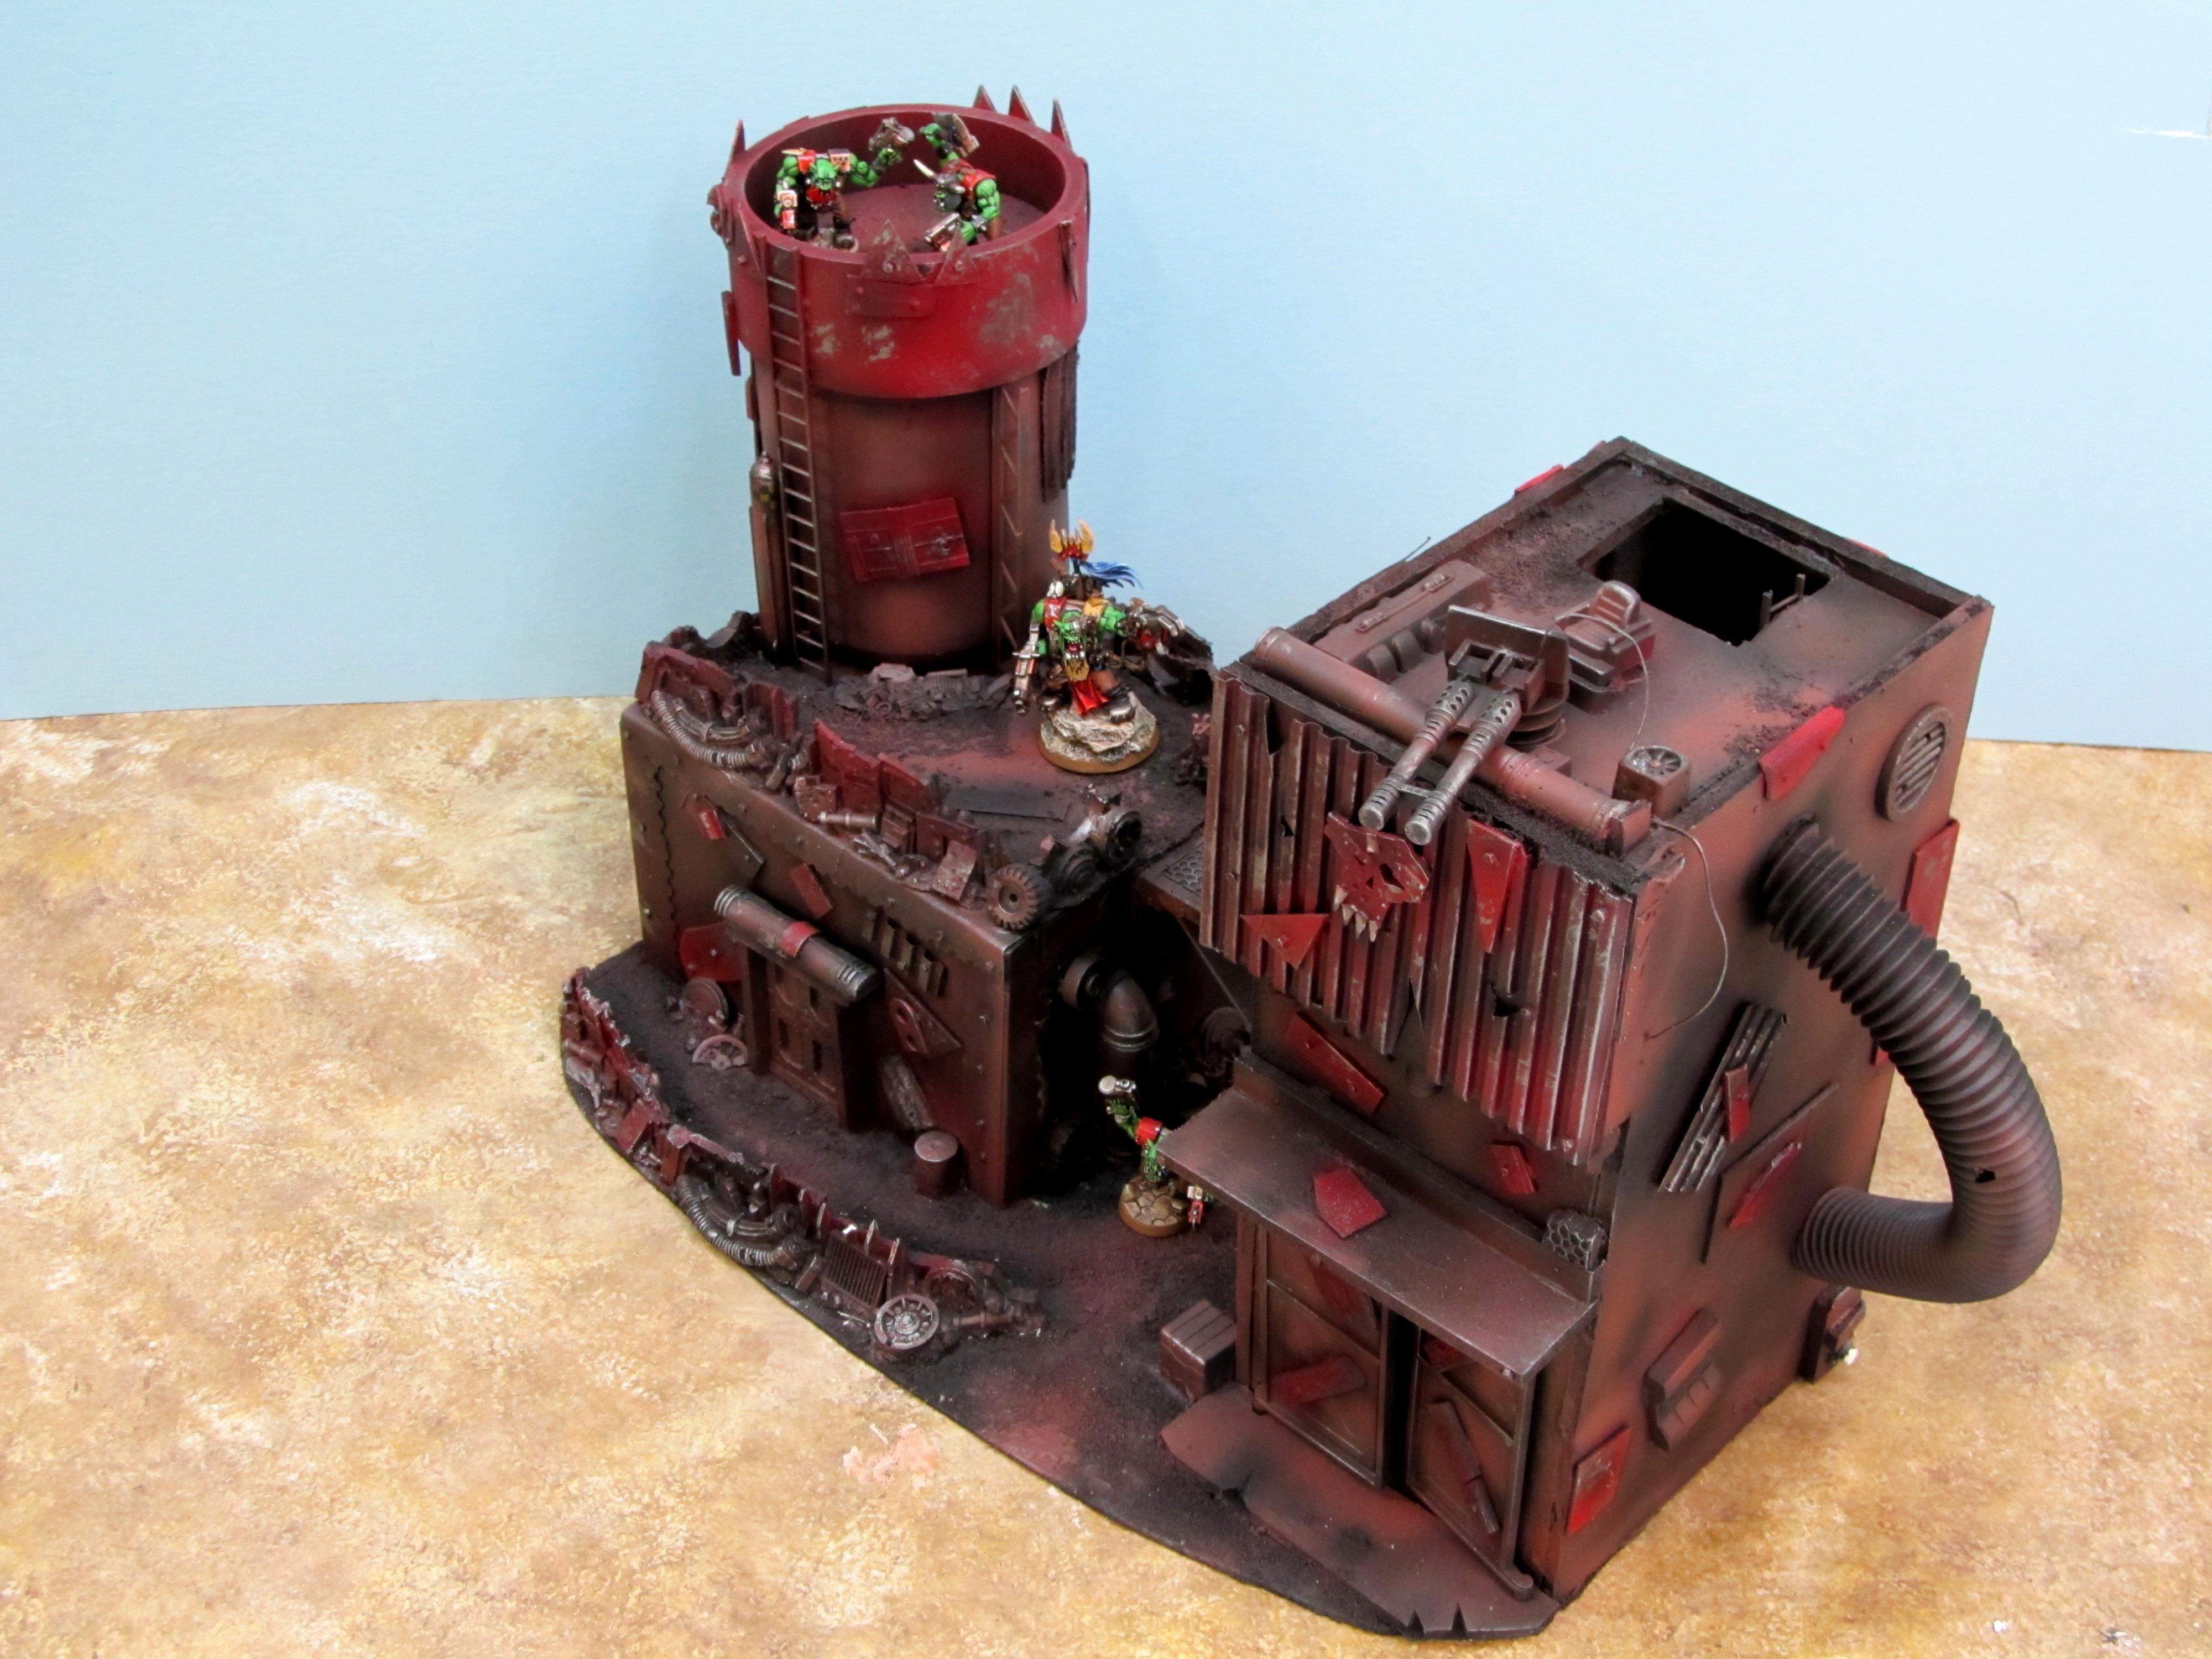 Base, Buildings, Fort, Orks, Structure, Terrain